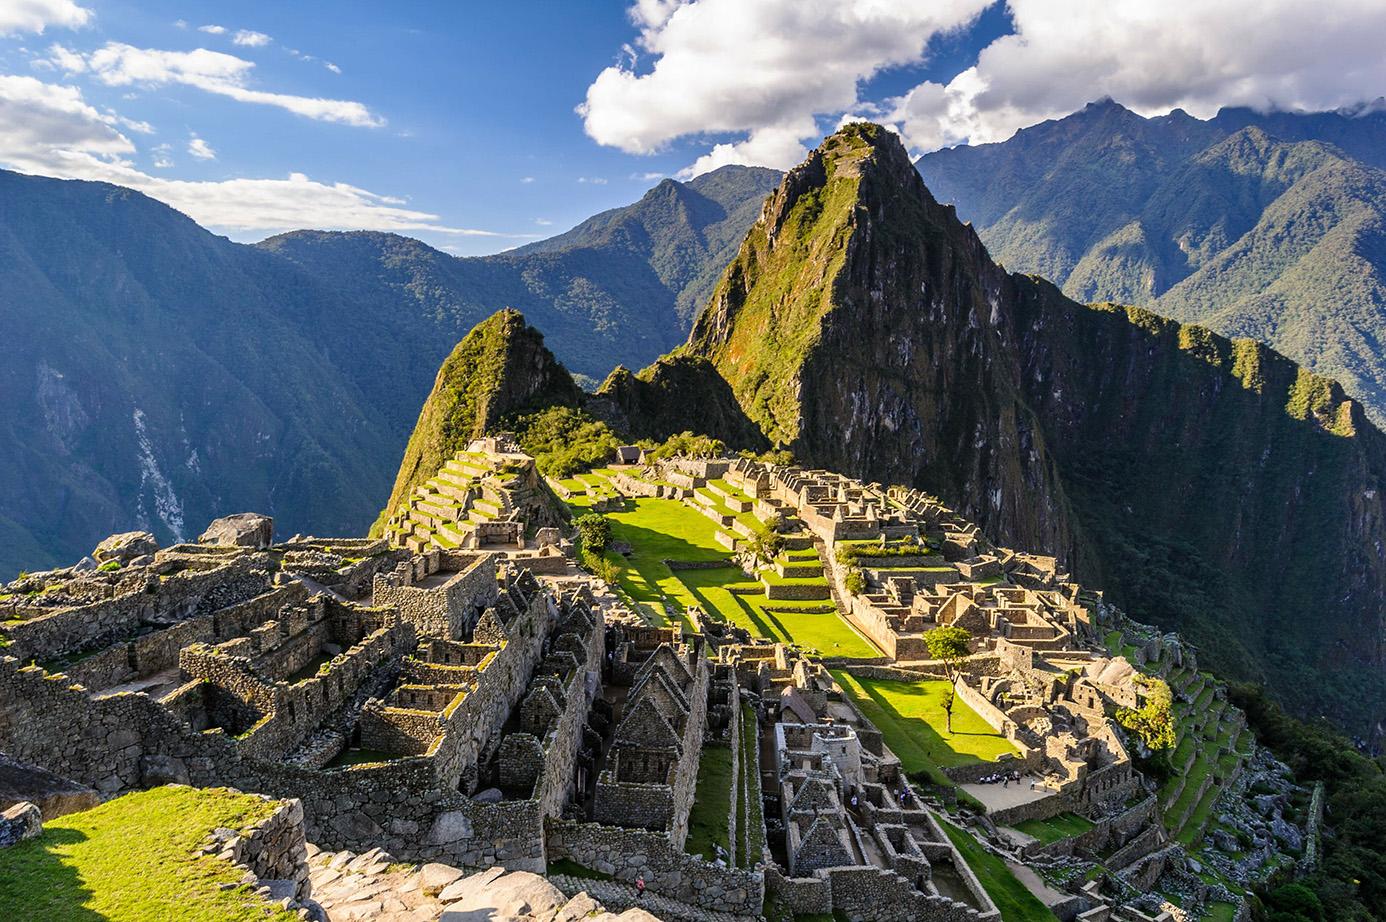 Machu Picchu X Sao Thome das Letras Portal Dimensional